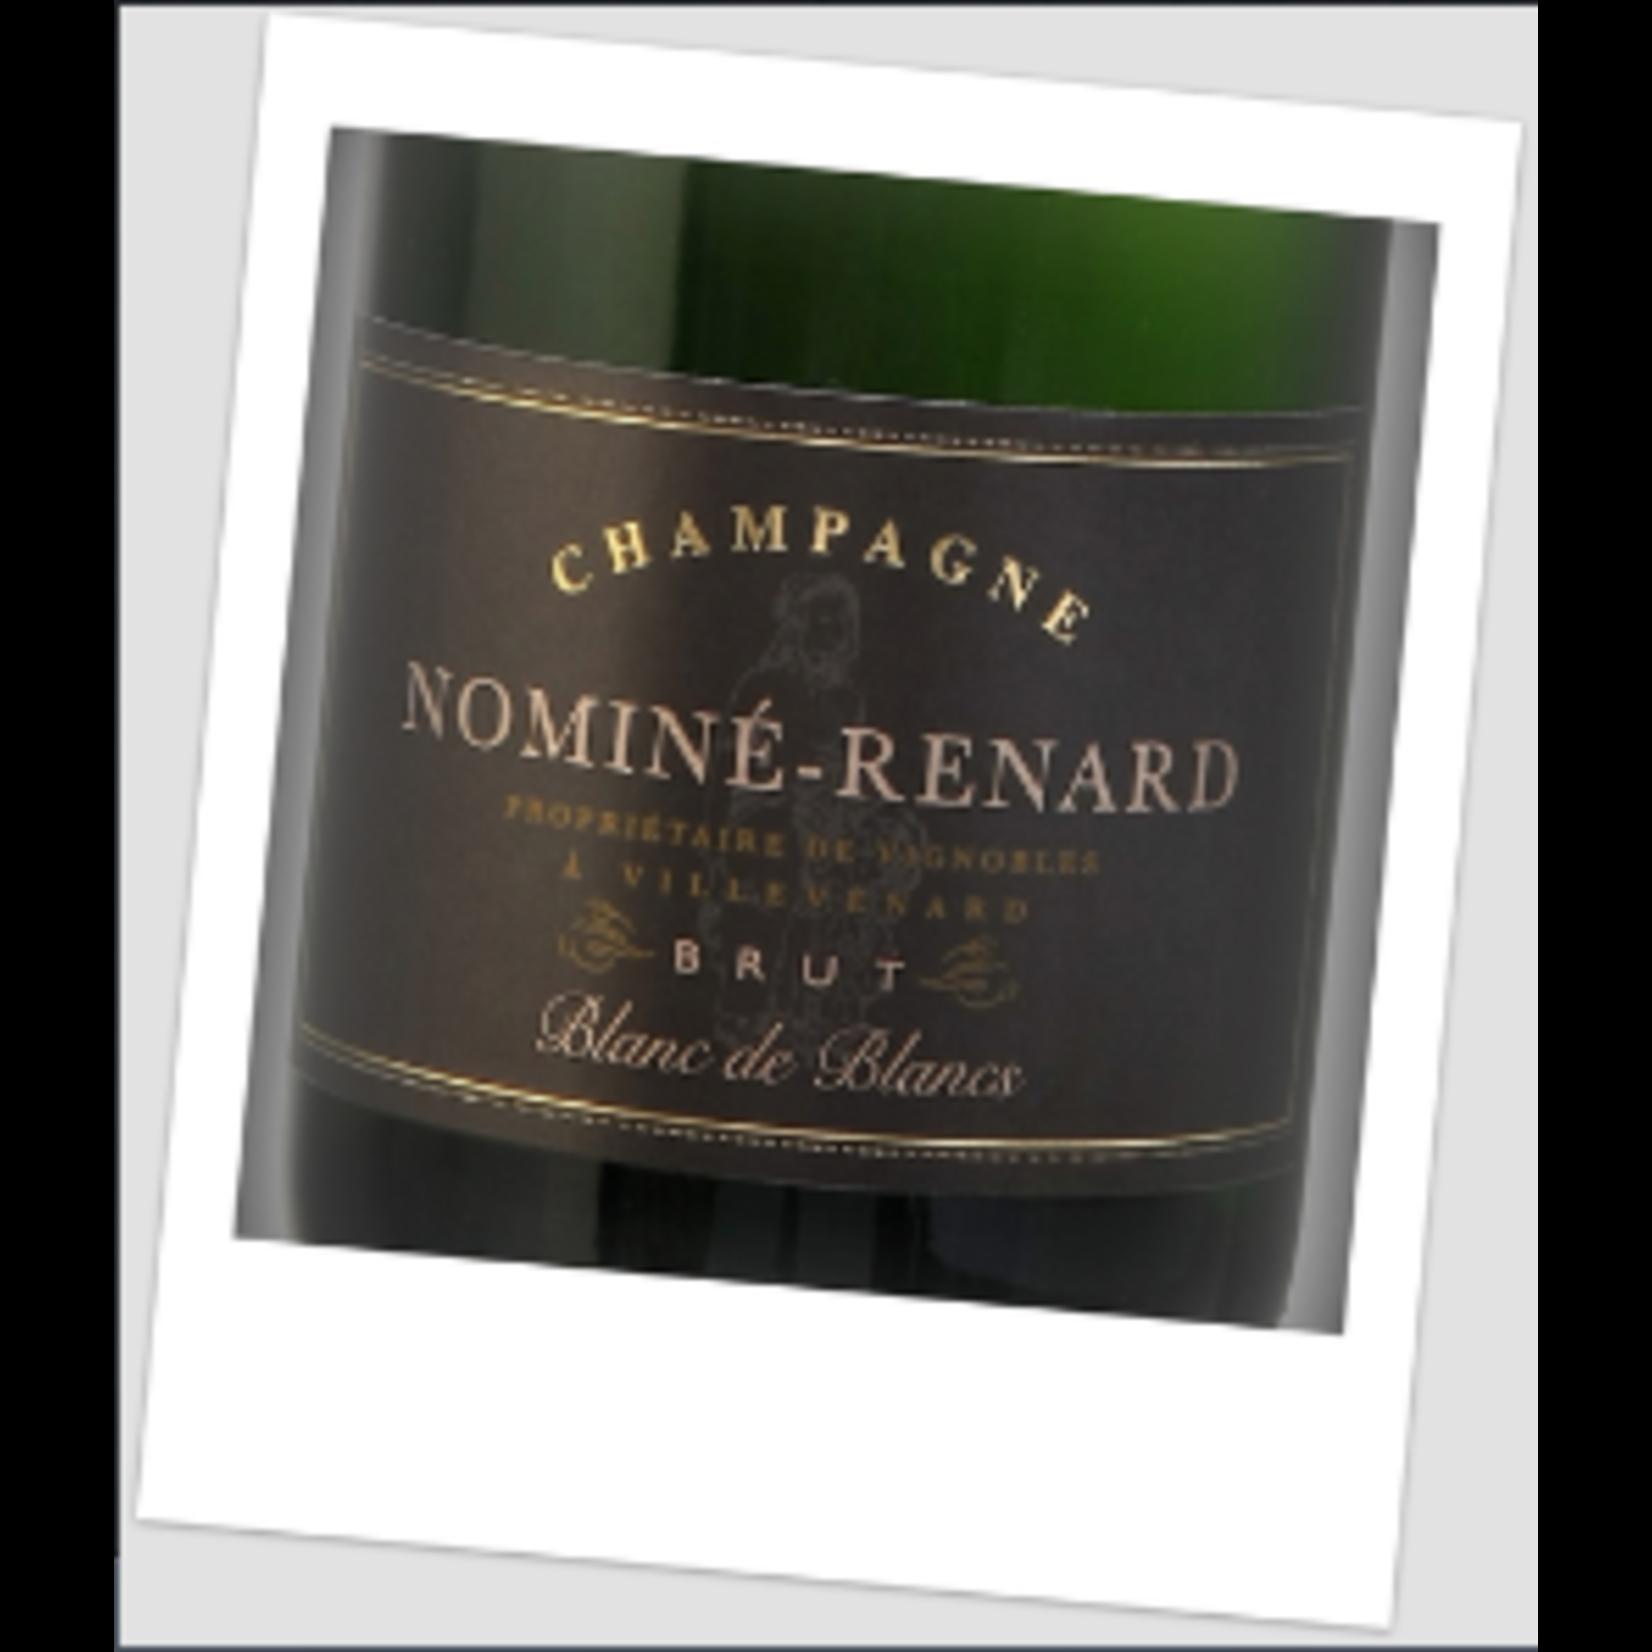 Nominé-Renard Nomine-Renard Blanc de Blancs Brut Champagne 90pts-WE